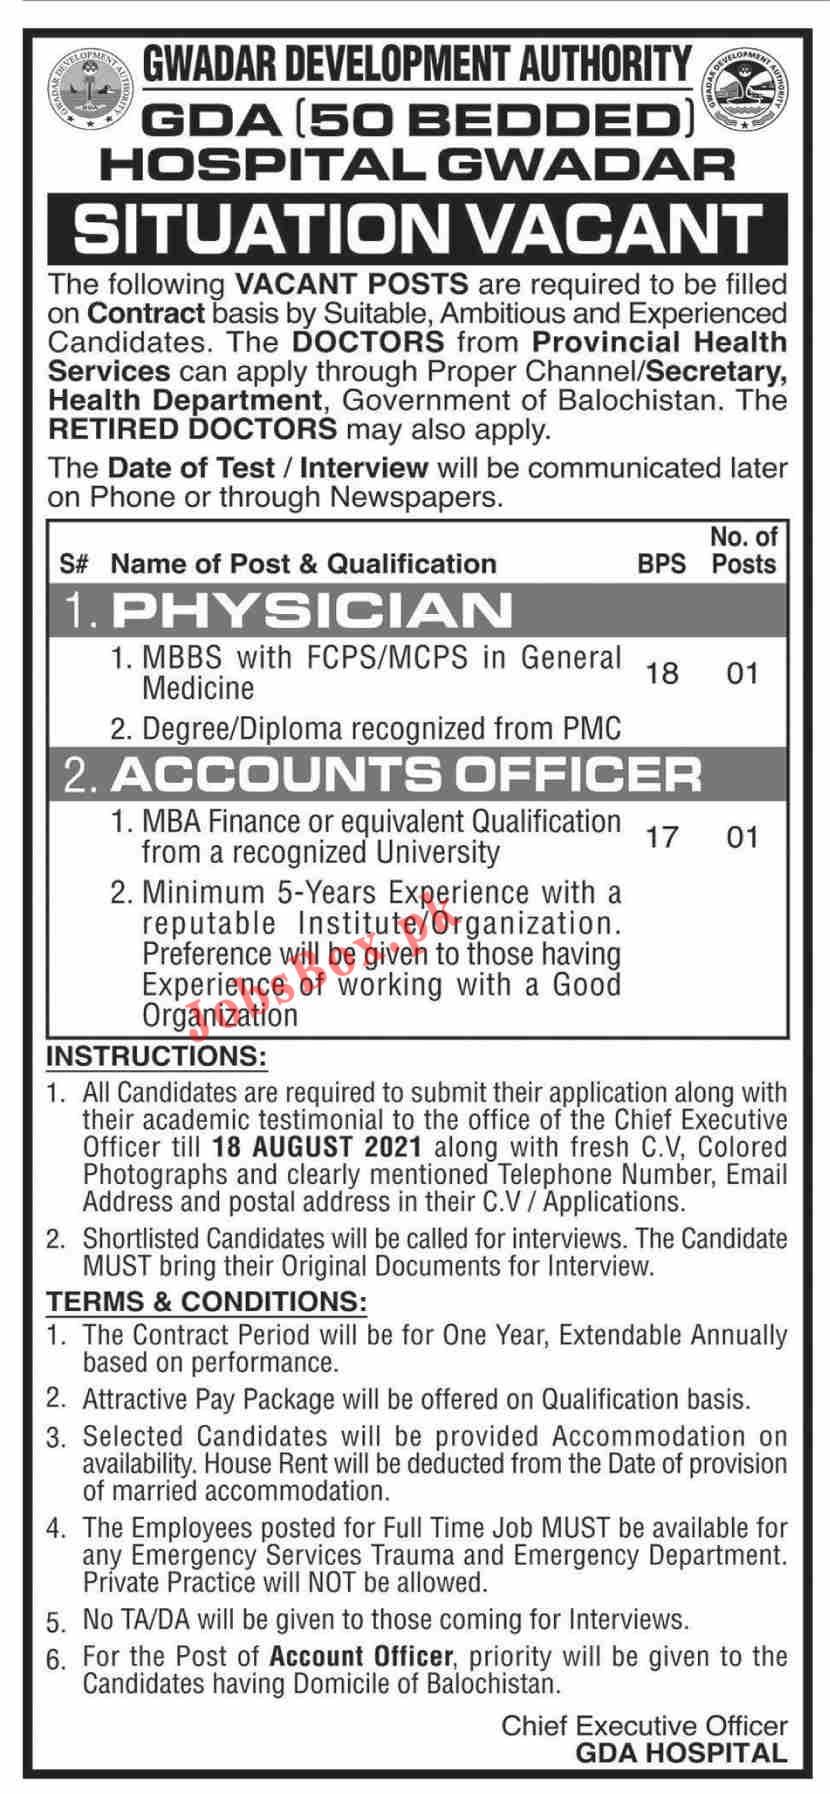 Gwadar Development Authority GDA Hospital Jobs 2021